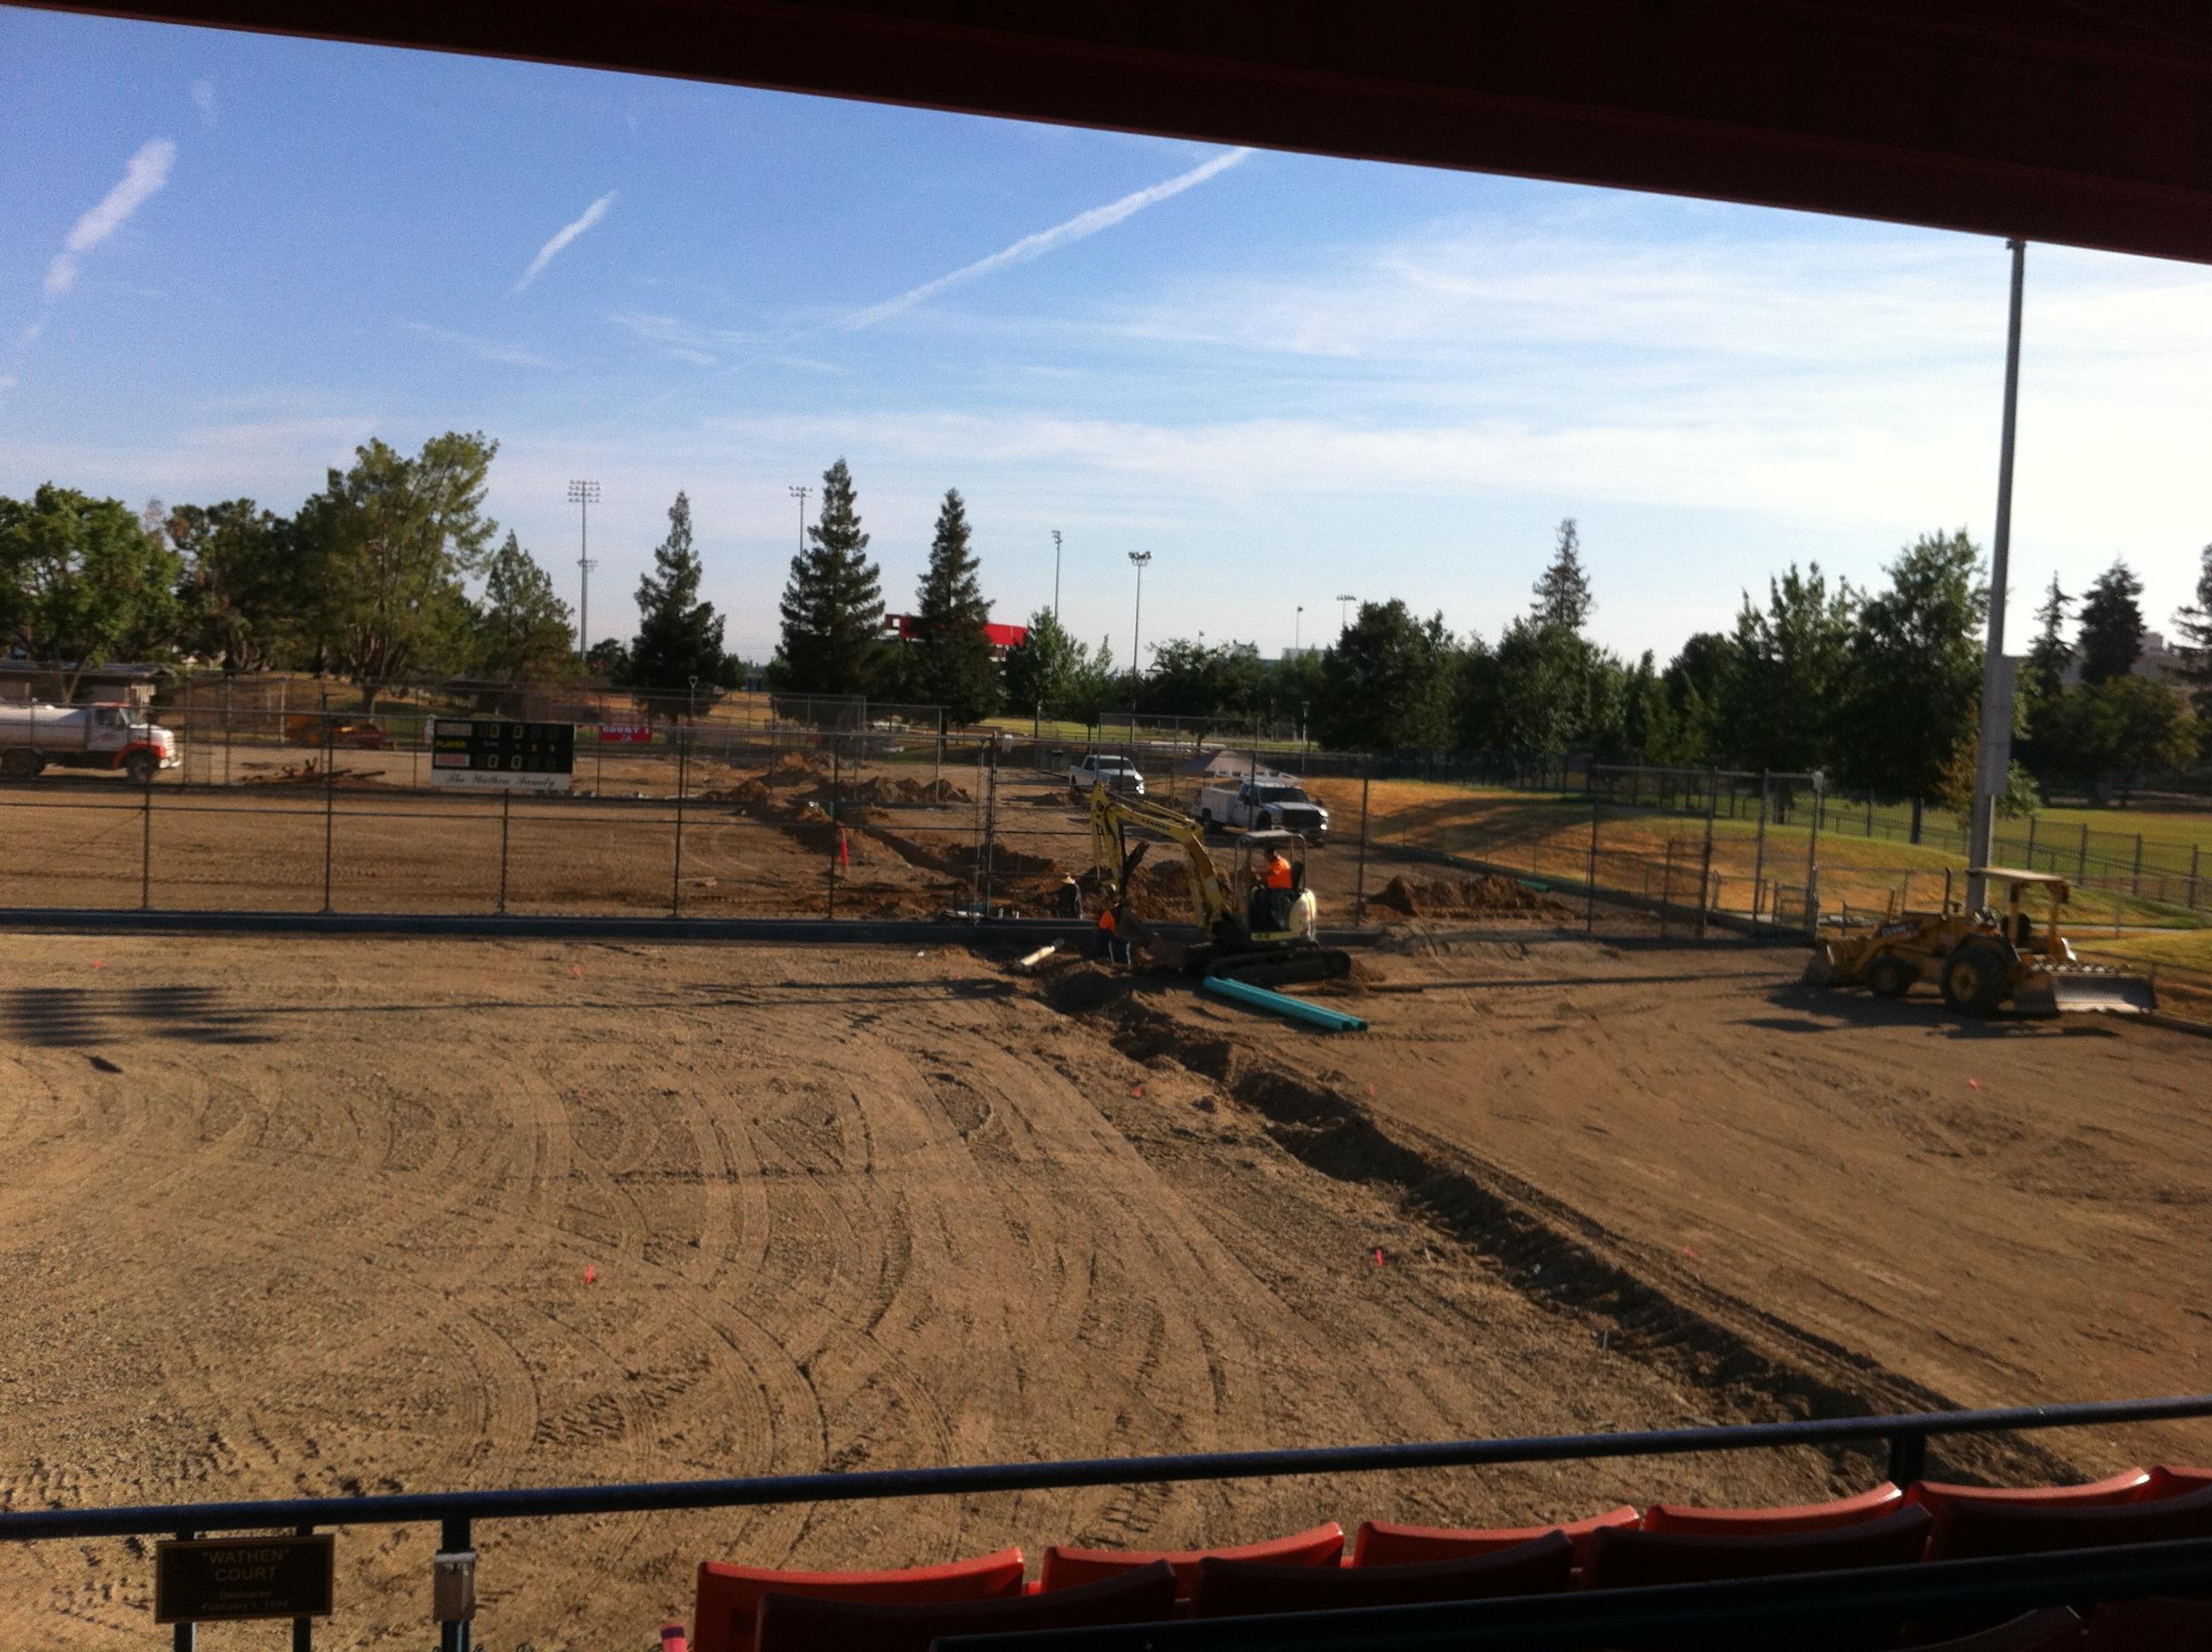 Fresno State Tennis Courts 3.jpg